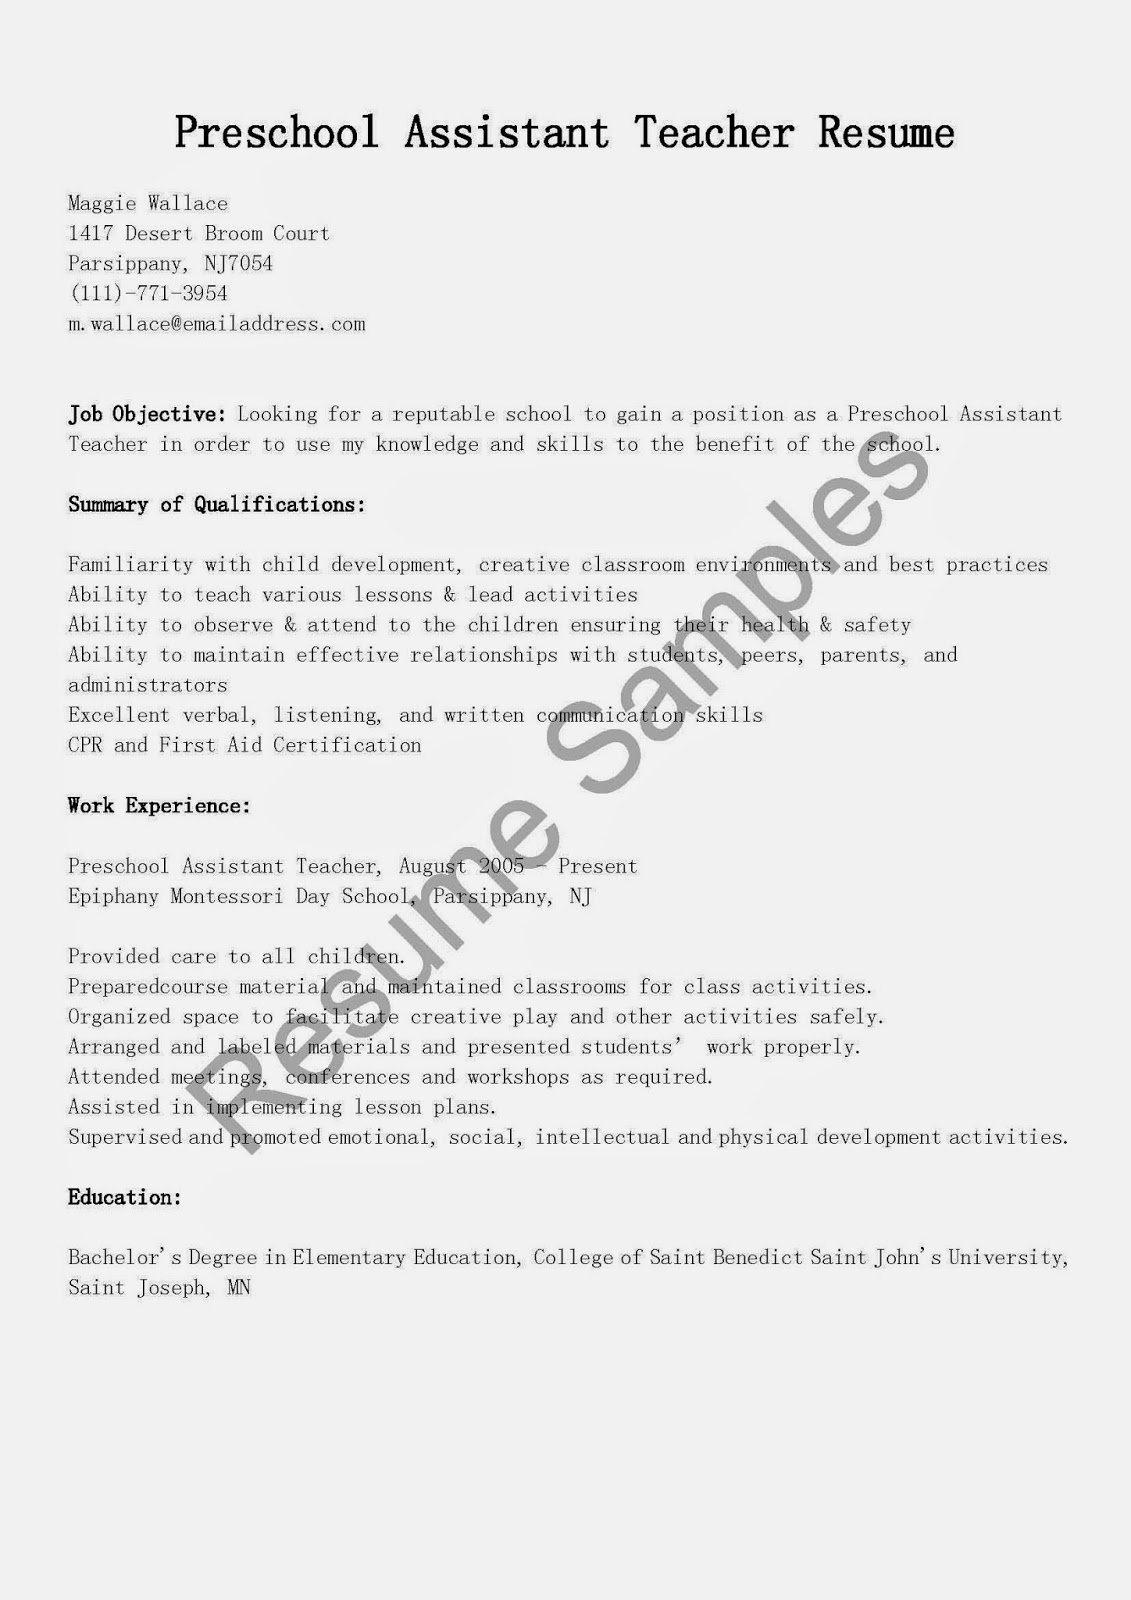 Resume Samples Preschool assistant Teacher Resume Sample